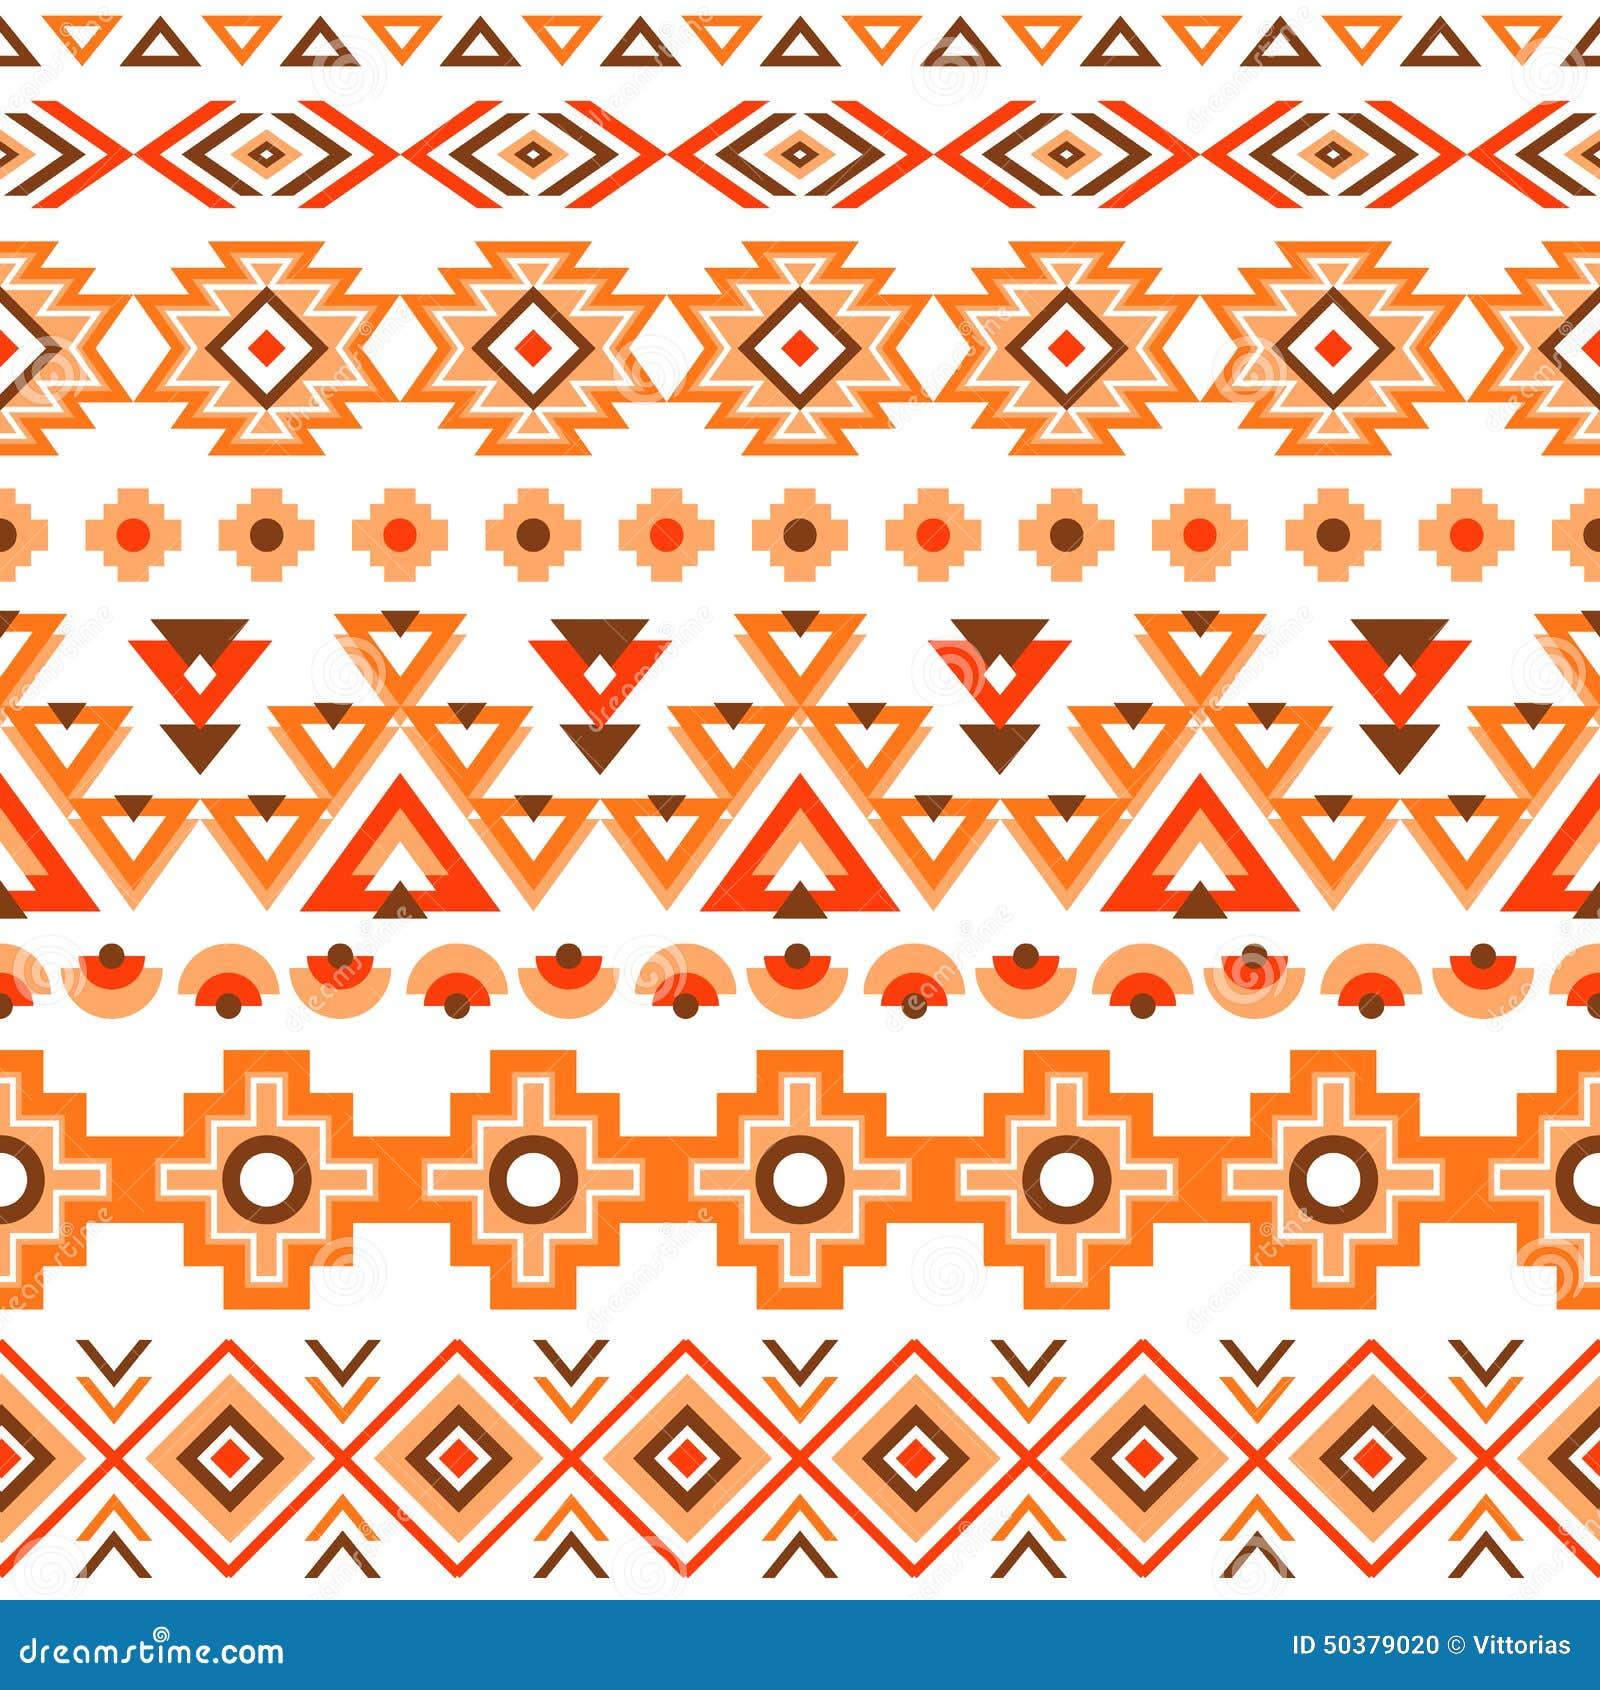 tribal design wallpaper brown - photo #45